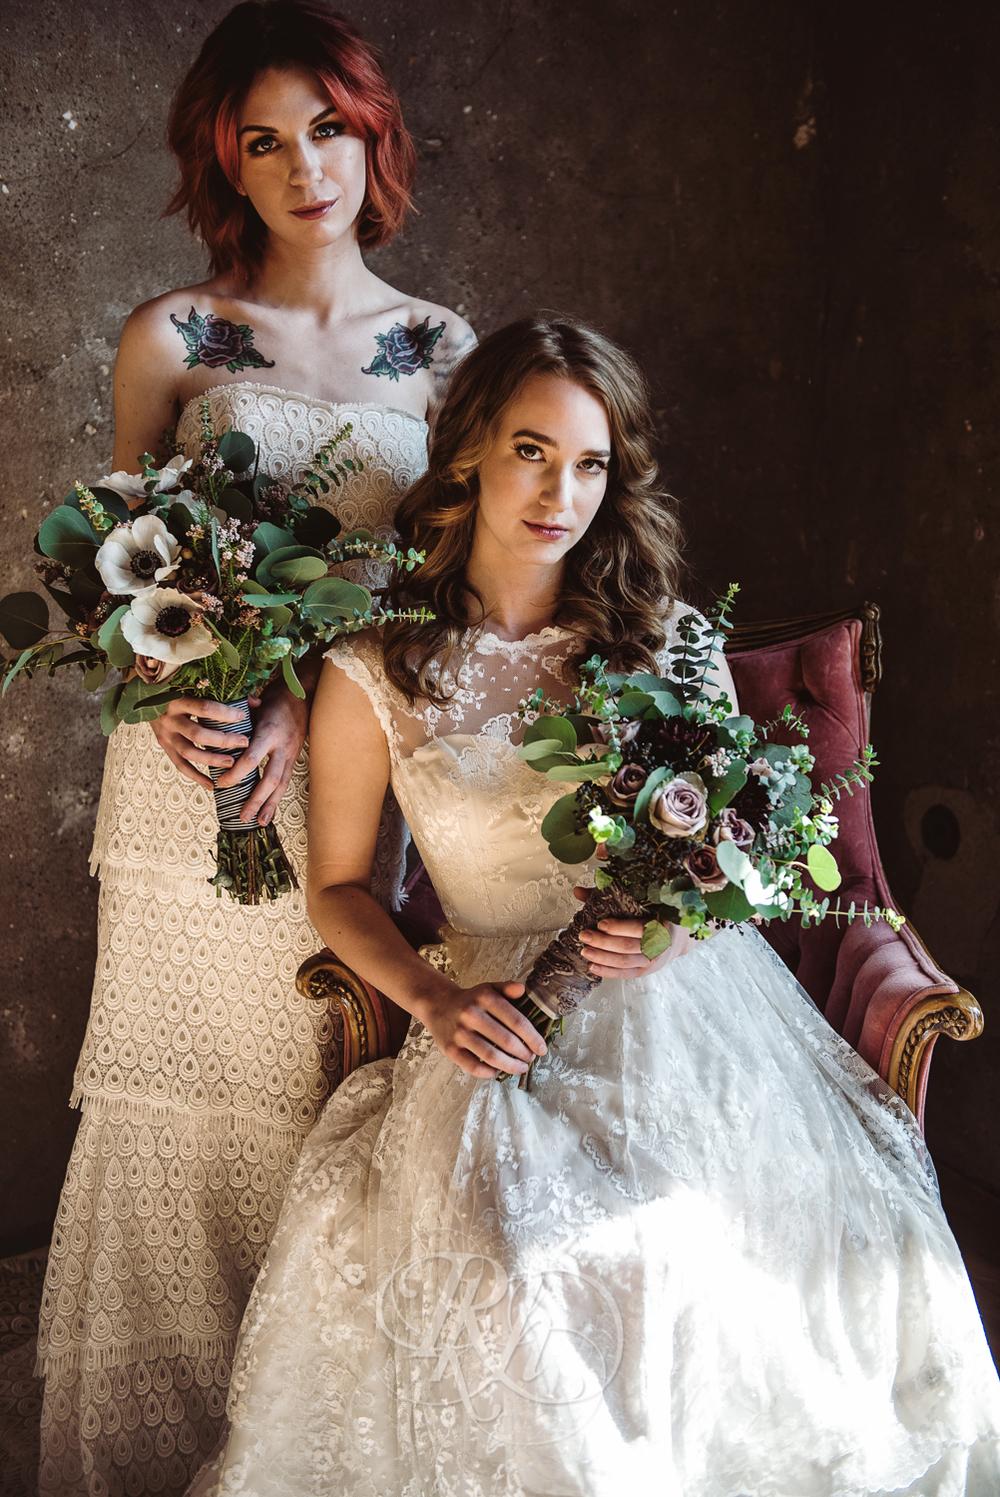 Minneapolis Wedding Shoot - RKH Images - Minnesota Wedding Photographer - Samples-18